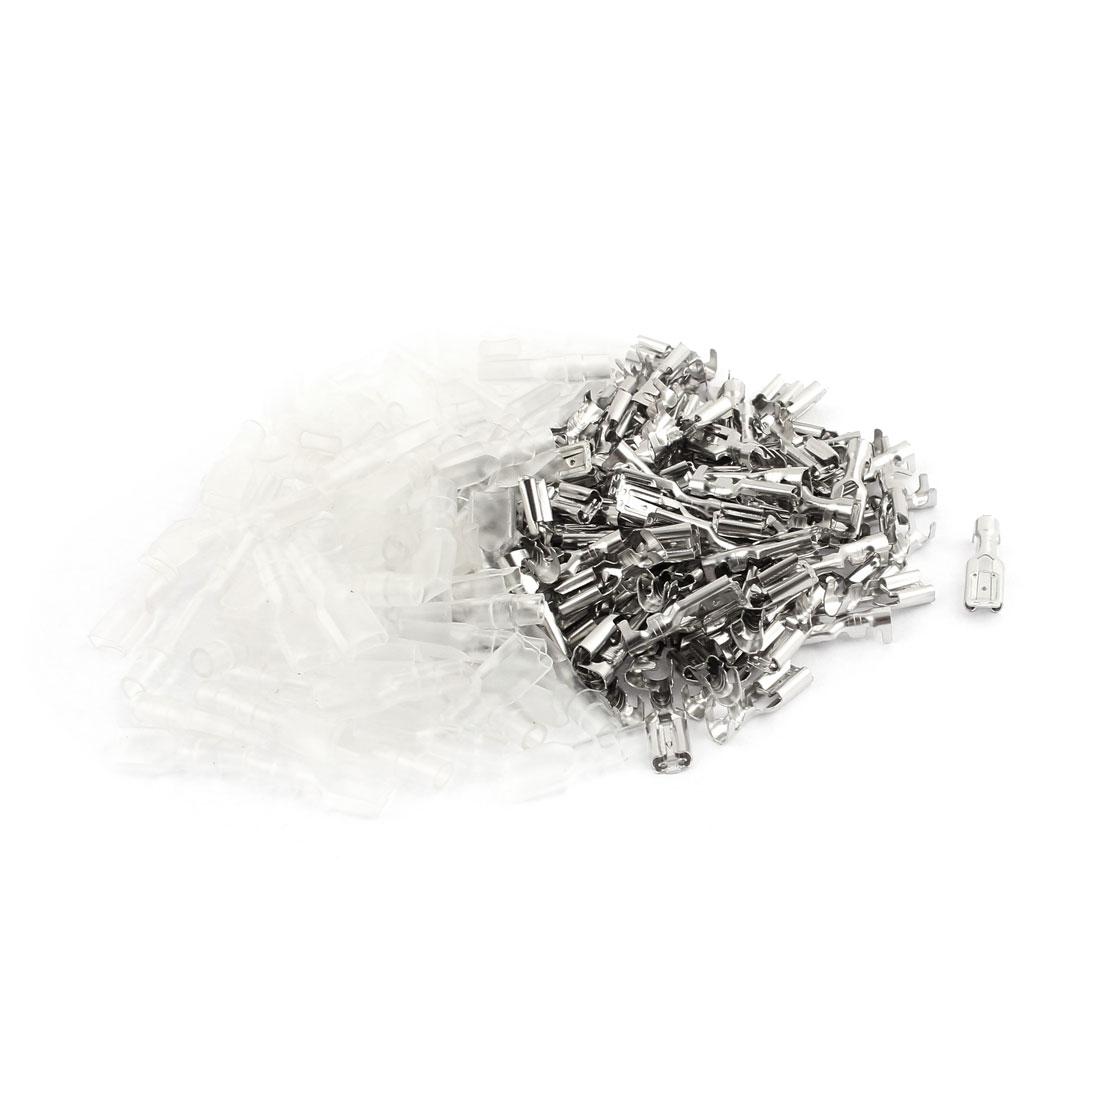 100 Sets Silver Tone 4.8mm Width Female Spade Crimp Terminal Connectors w Cover